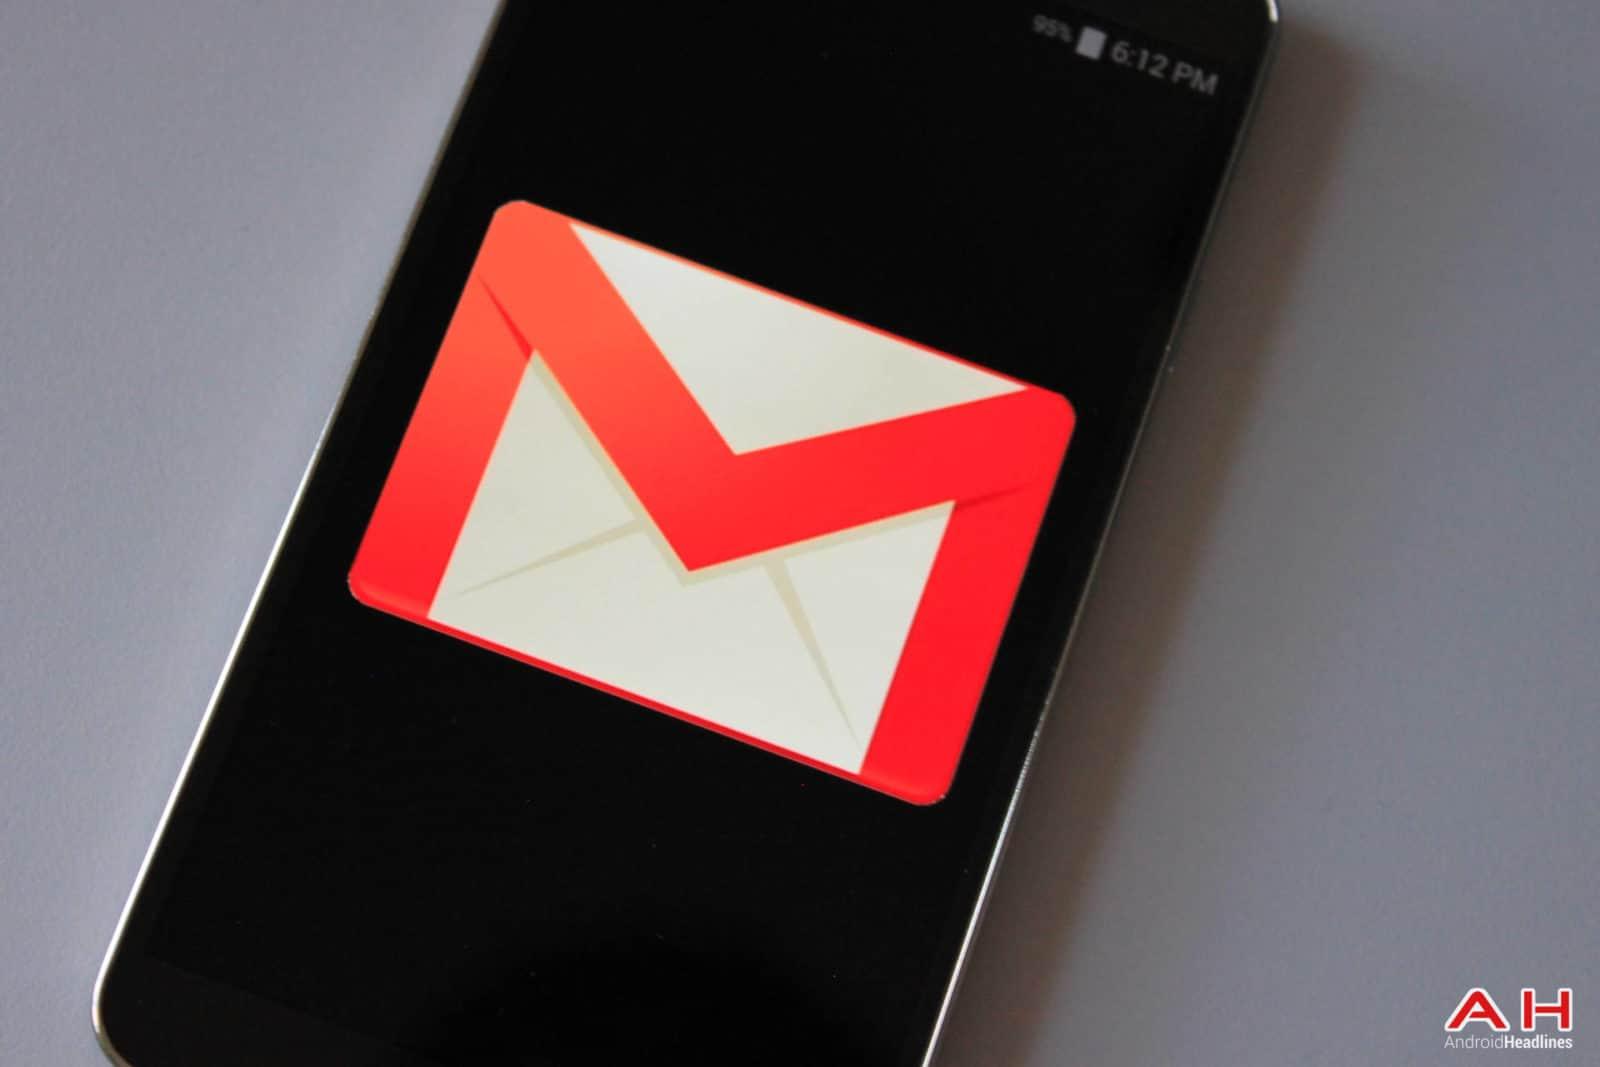 AH Google gmail Logo 1.4